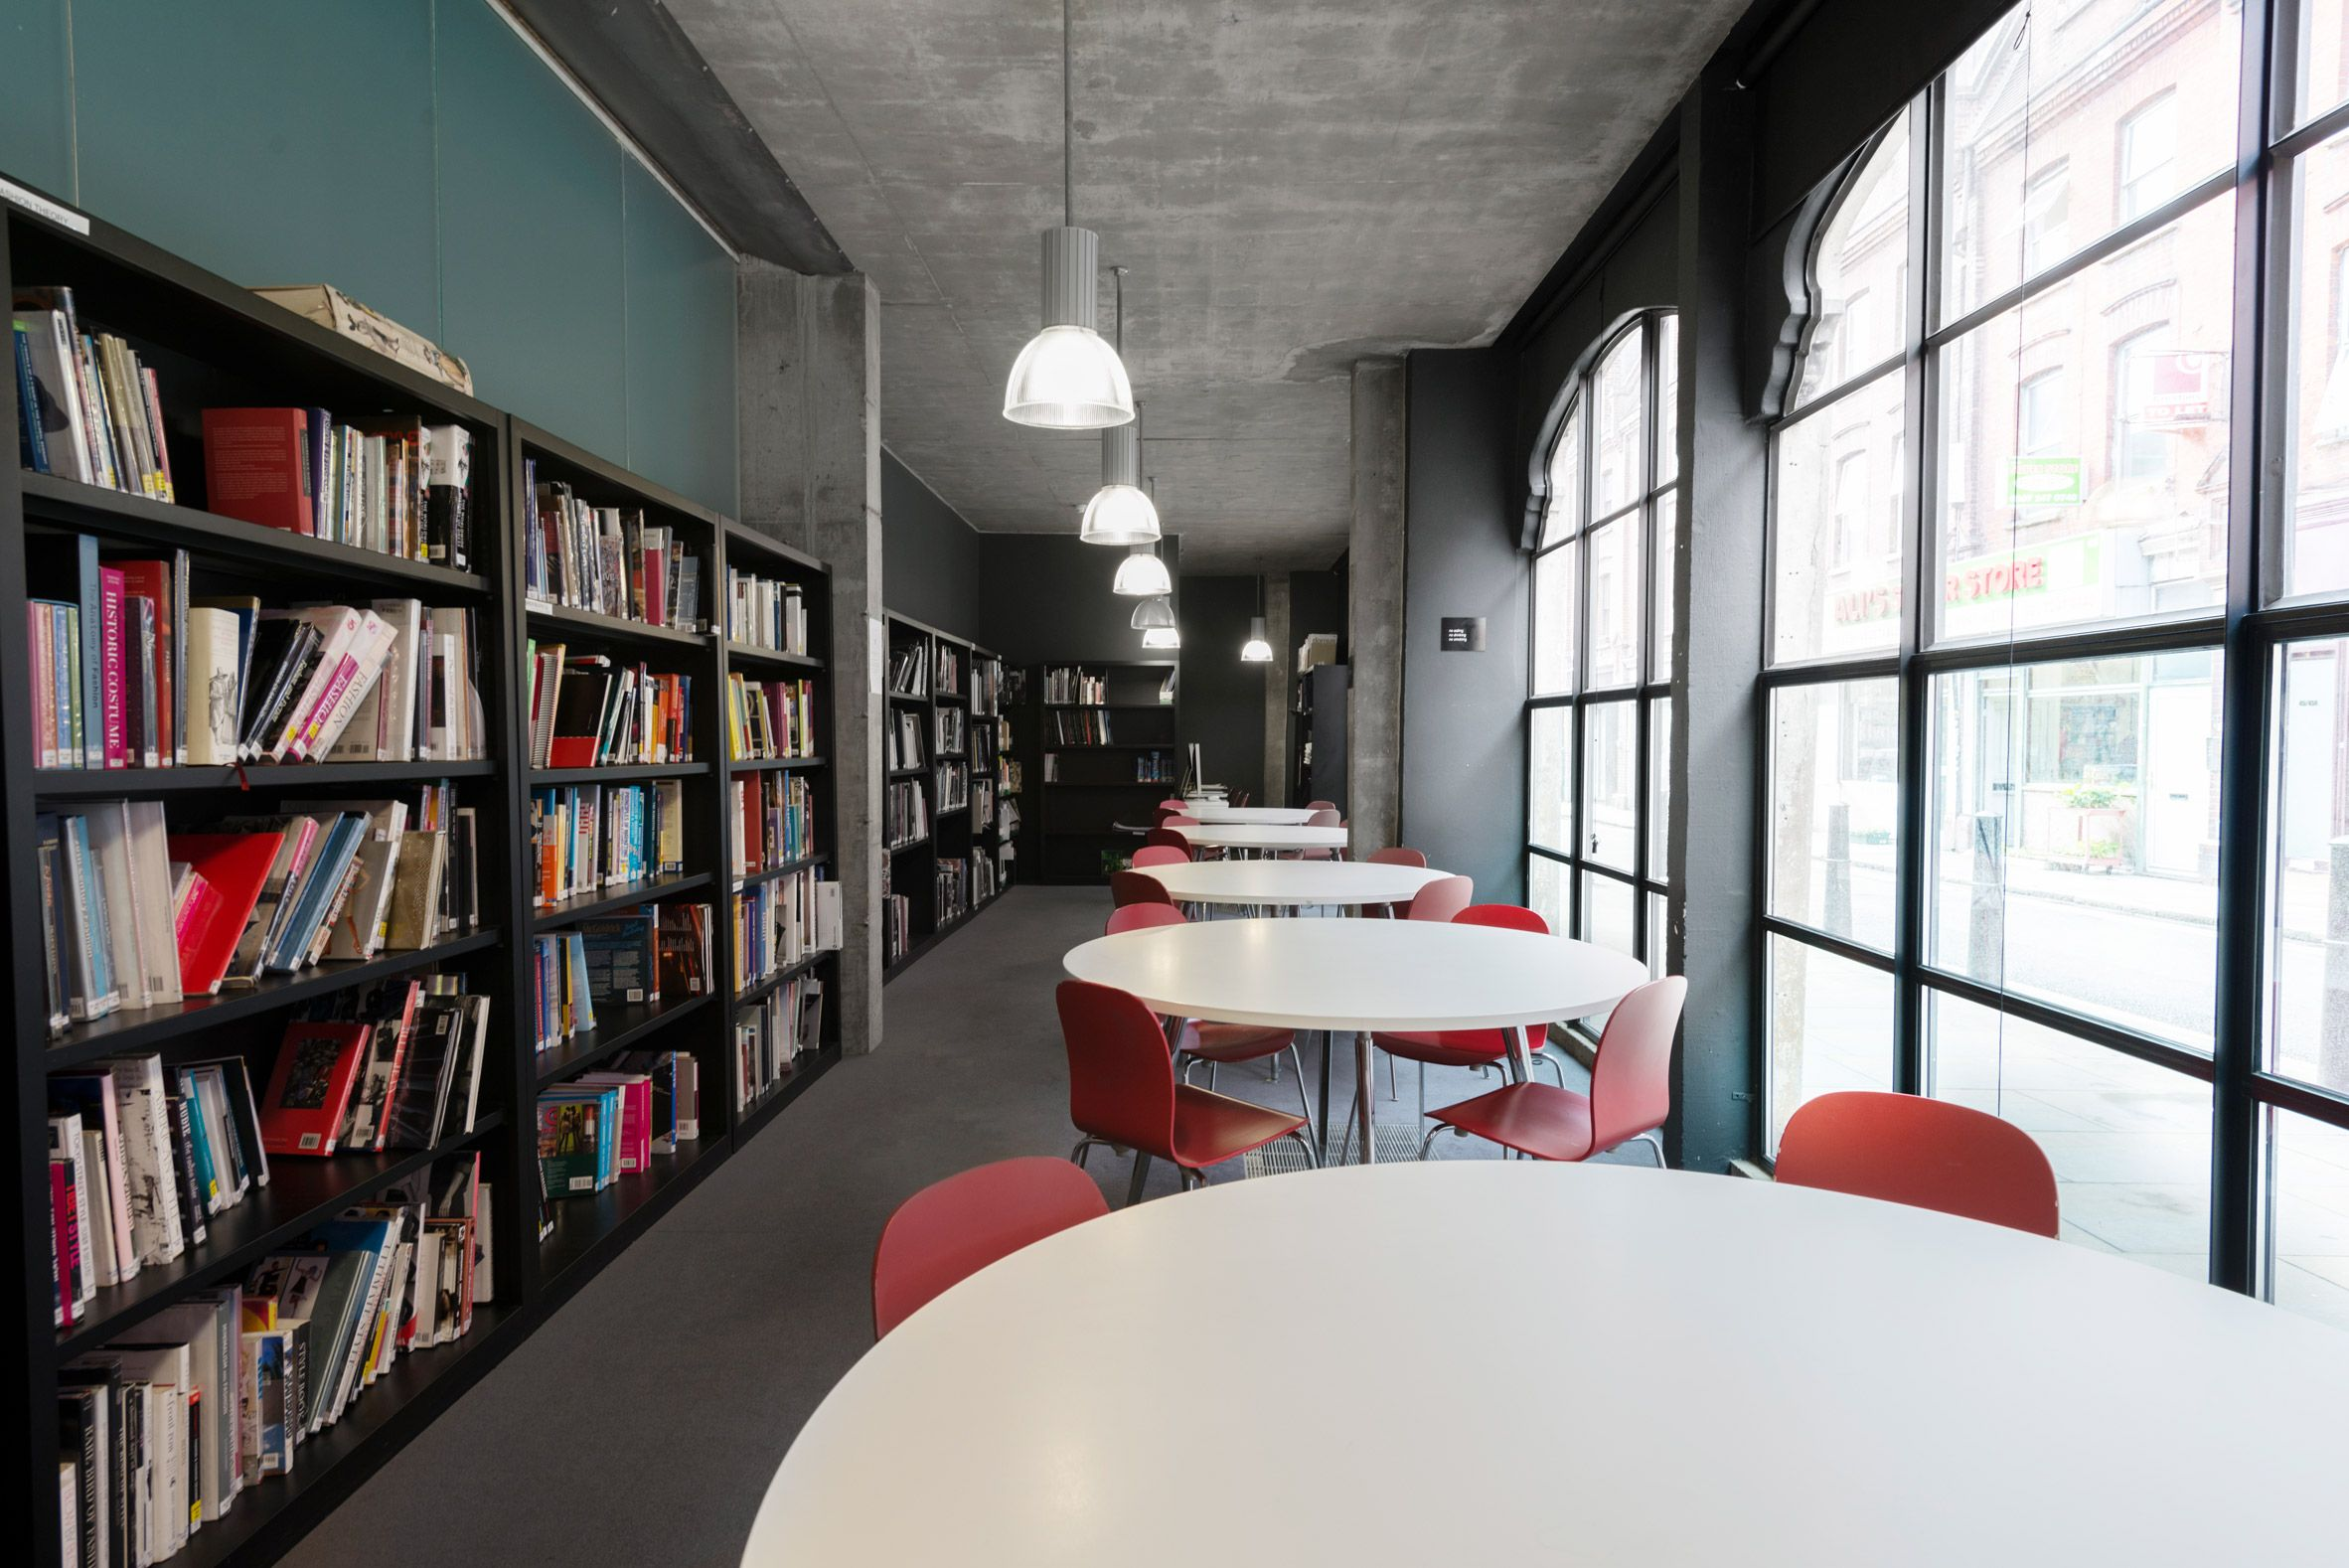 Istituto Marangoni Announces New Design Courses At Its London